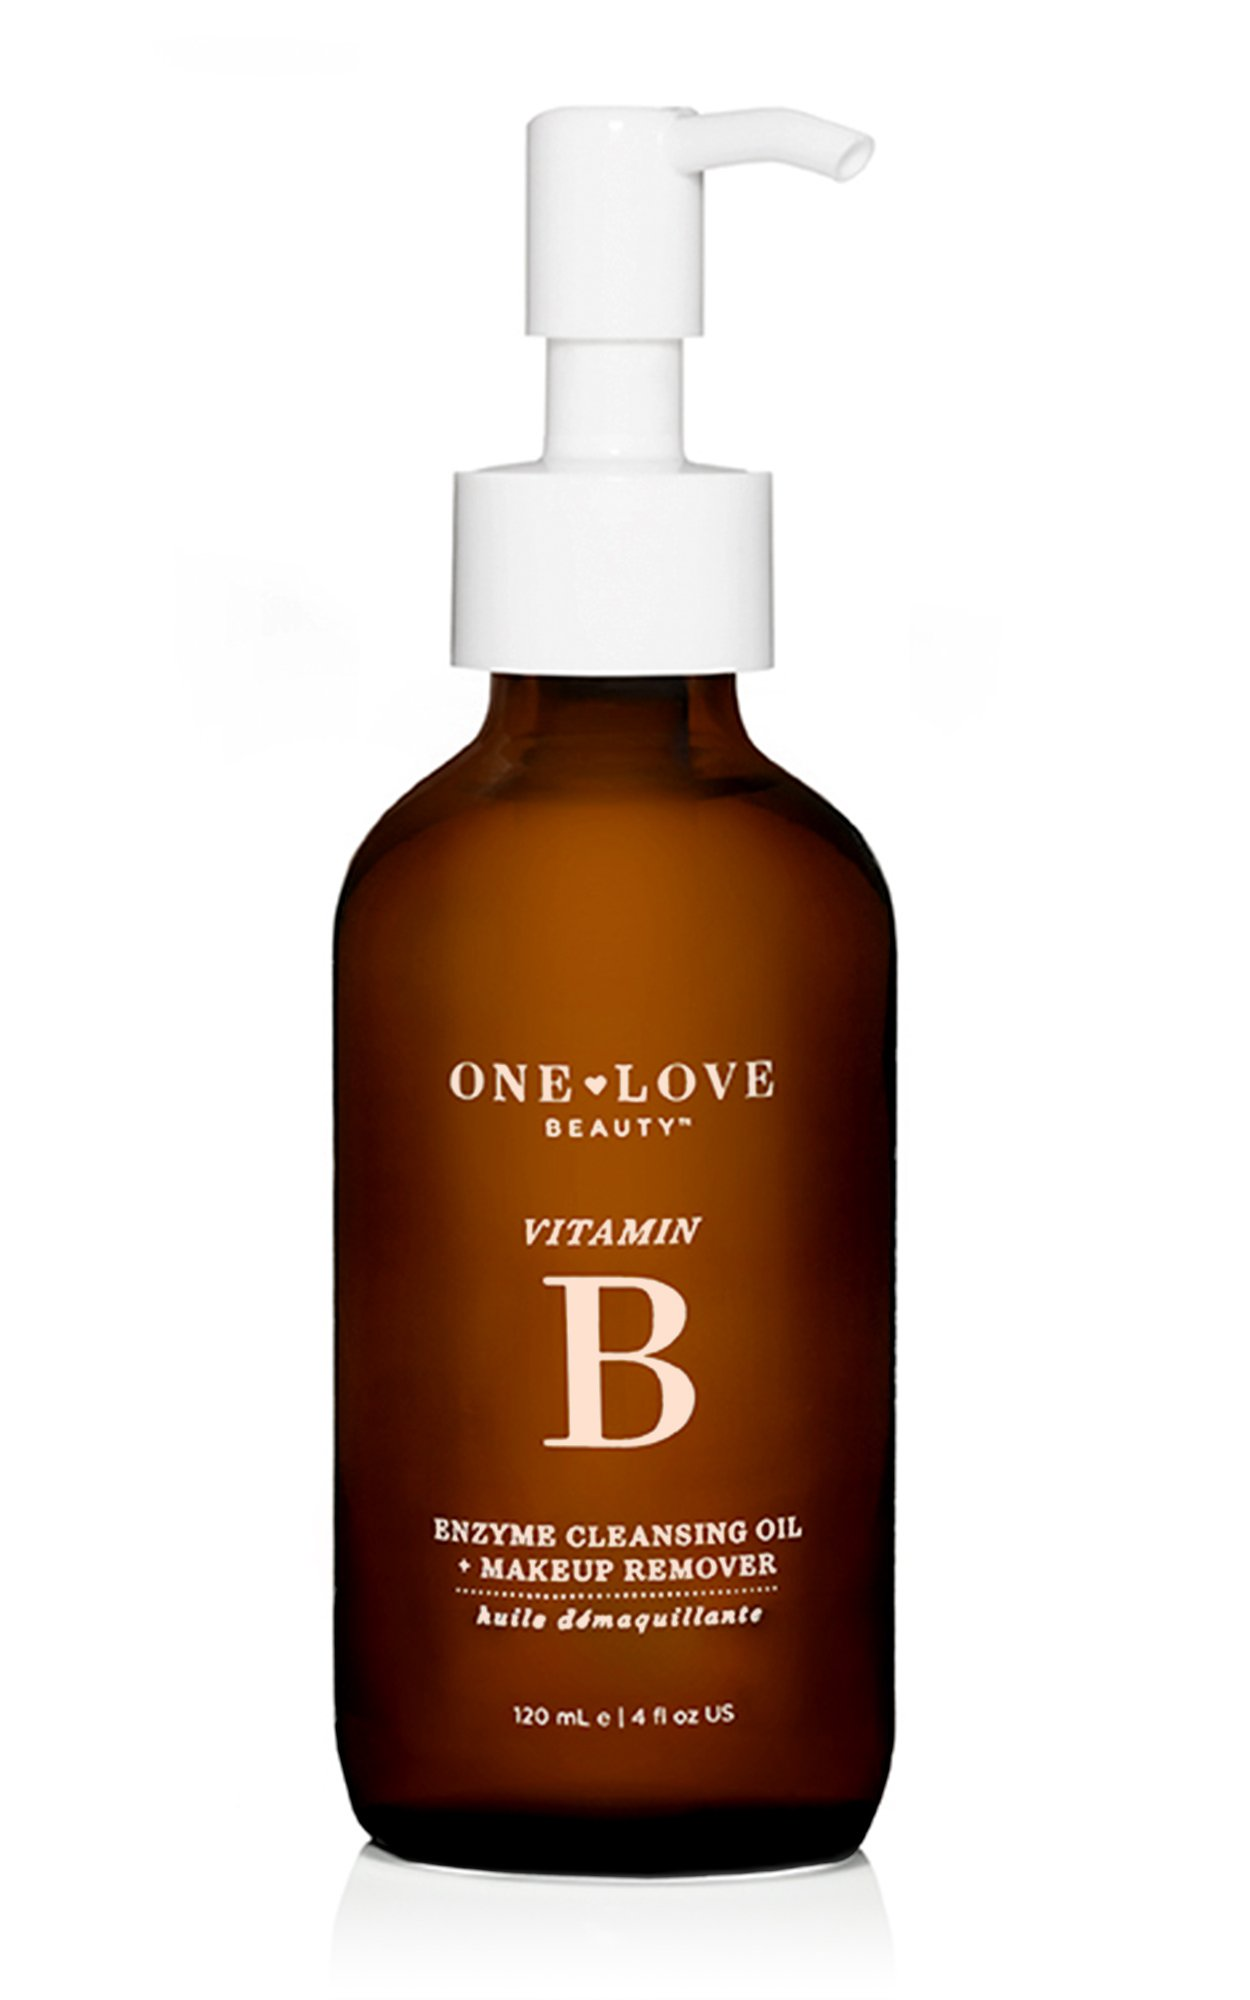 Vitamin-B-Cleansing-Oil_5a66dfe4-46c5-49d1-ae88-ec37eebb768f.jpg